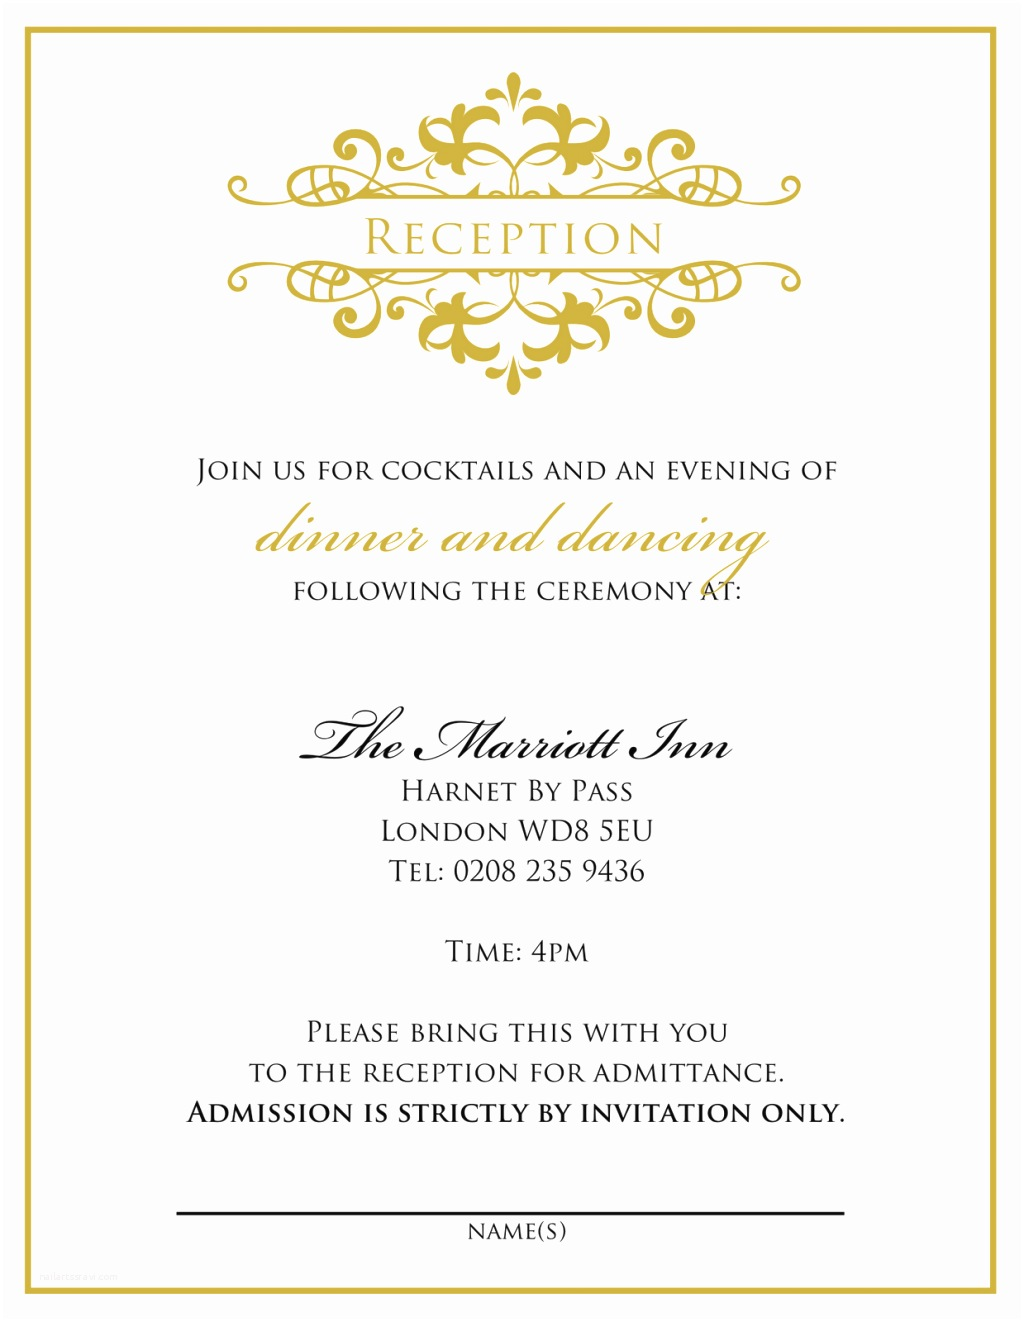 Wedding Invitation Verses Wedding Invitation Wording From Bride And